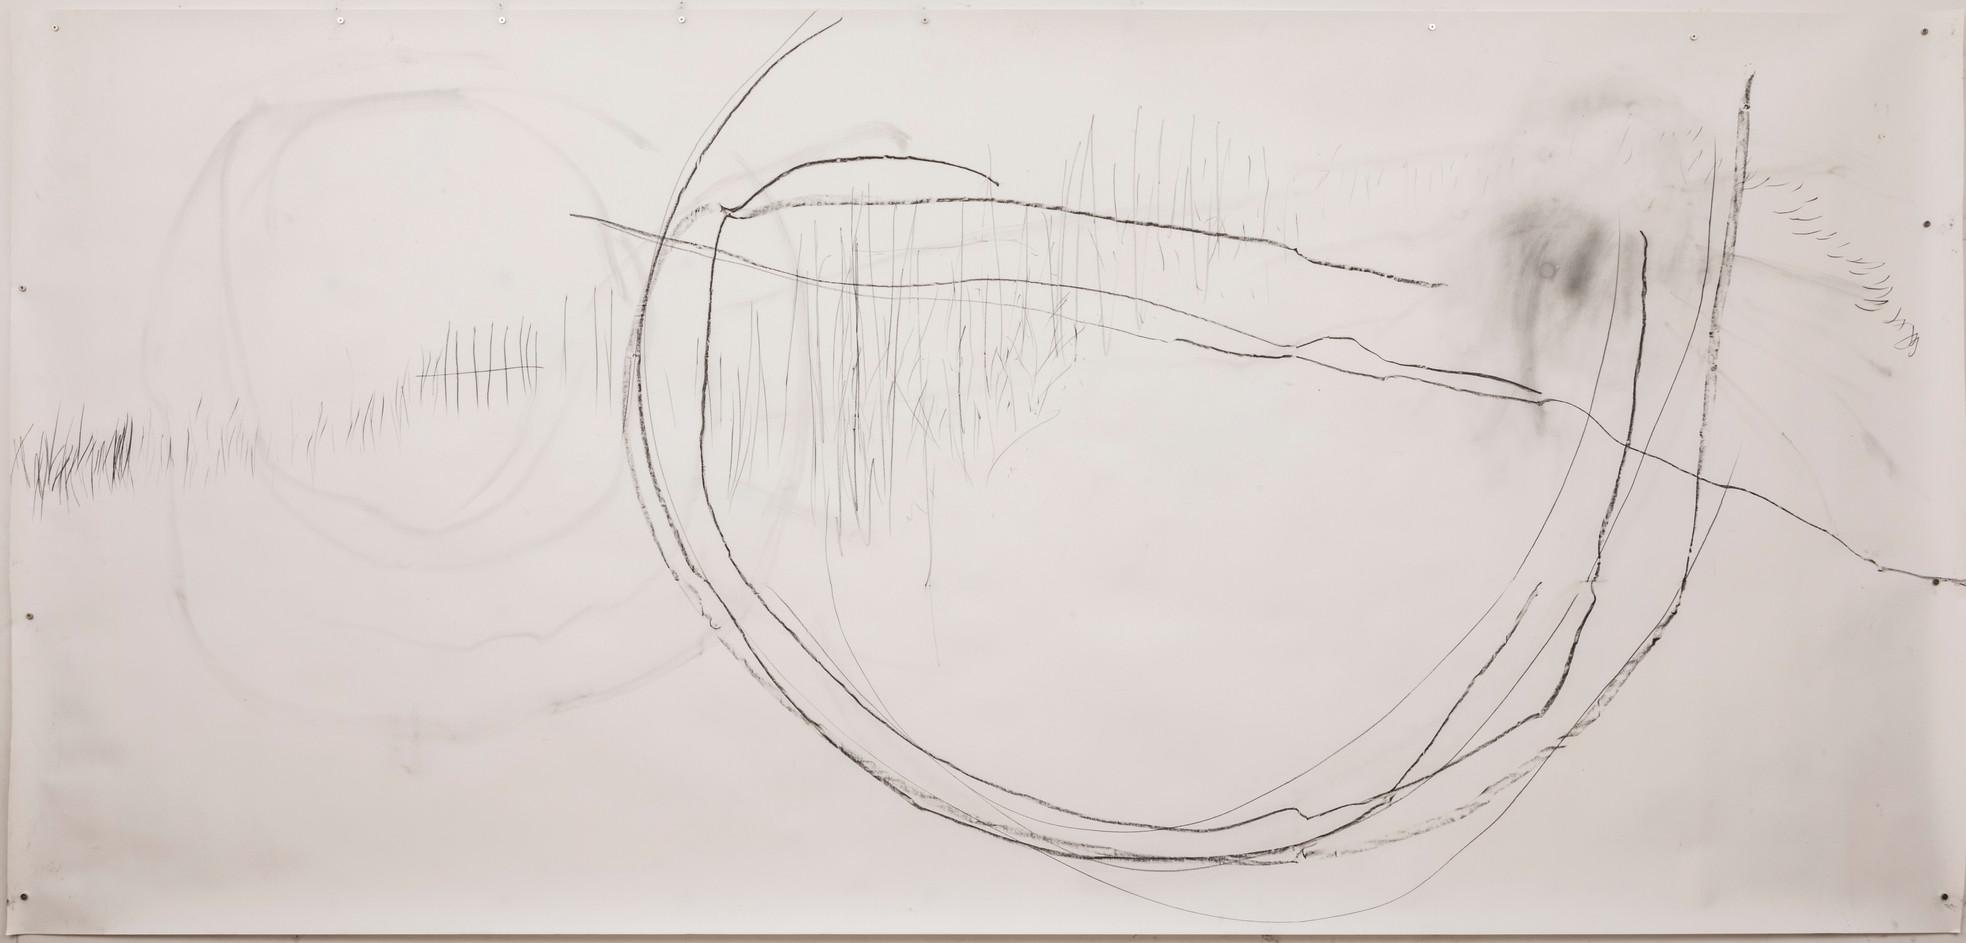 154 x 320 cm grafite, lapis conté sobre papel foto: Ruy Teixeira